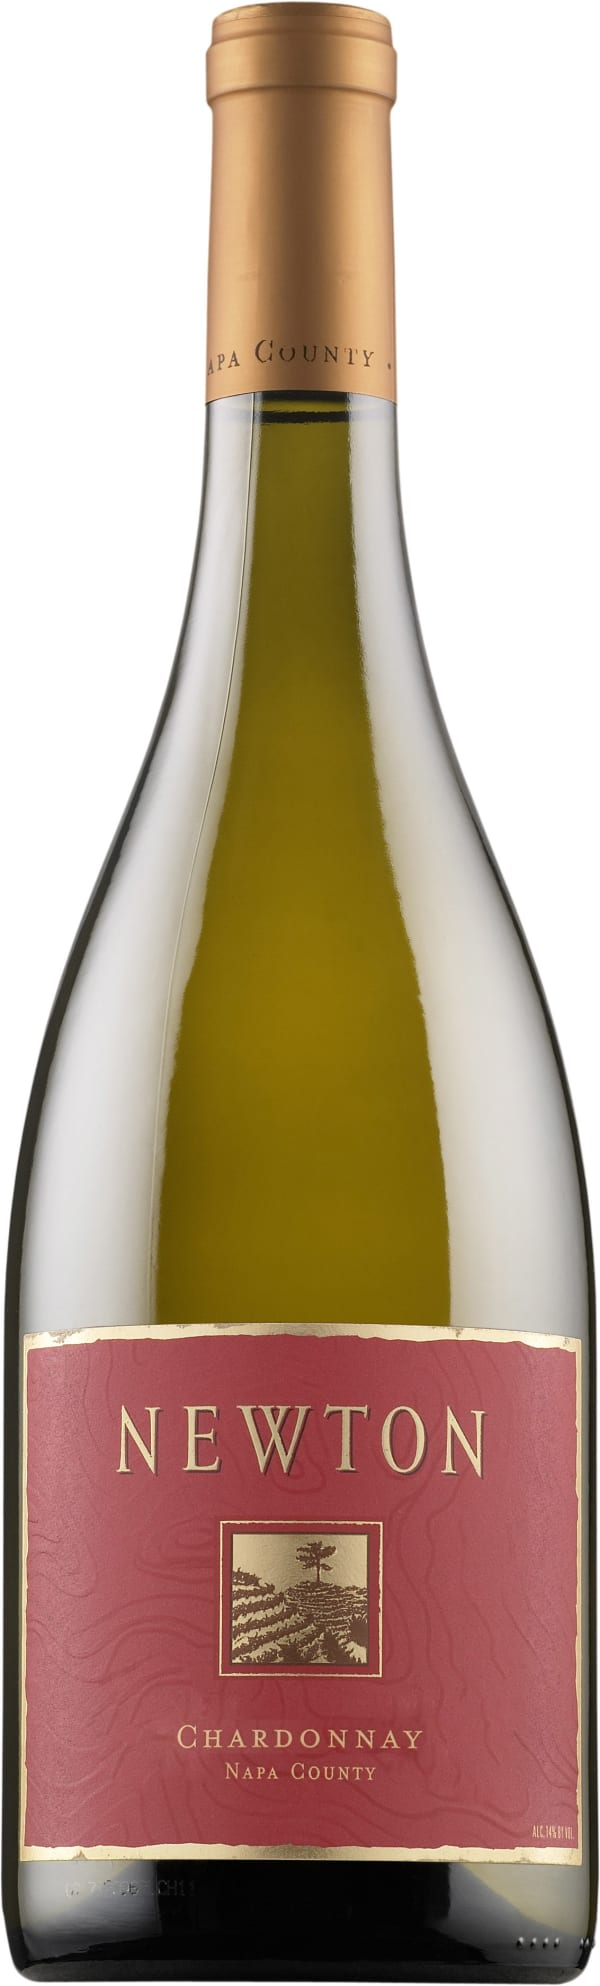 Newton Chardonnay 2015